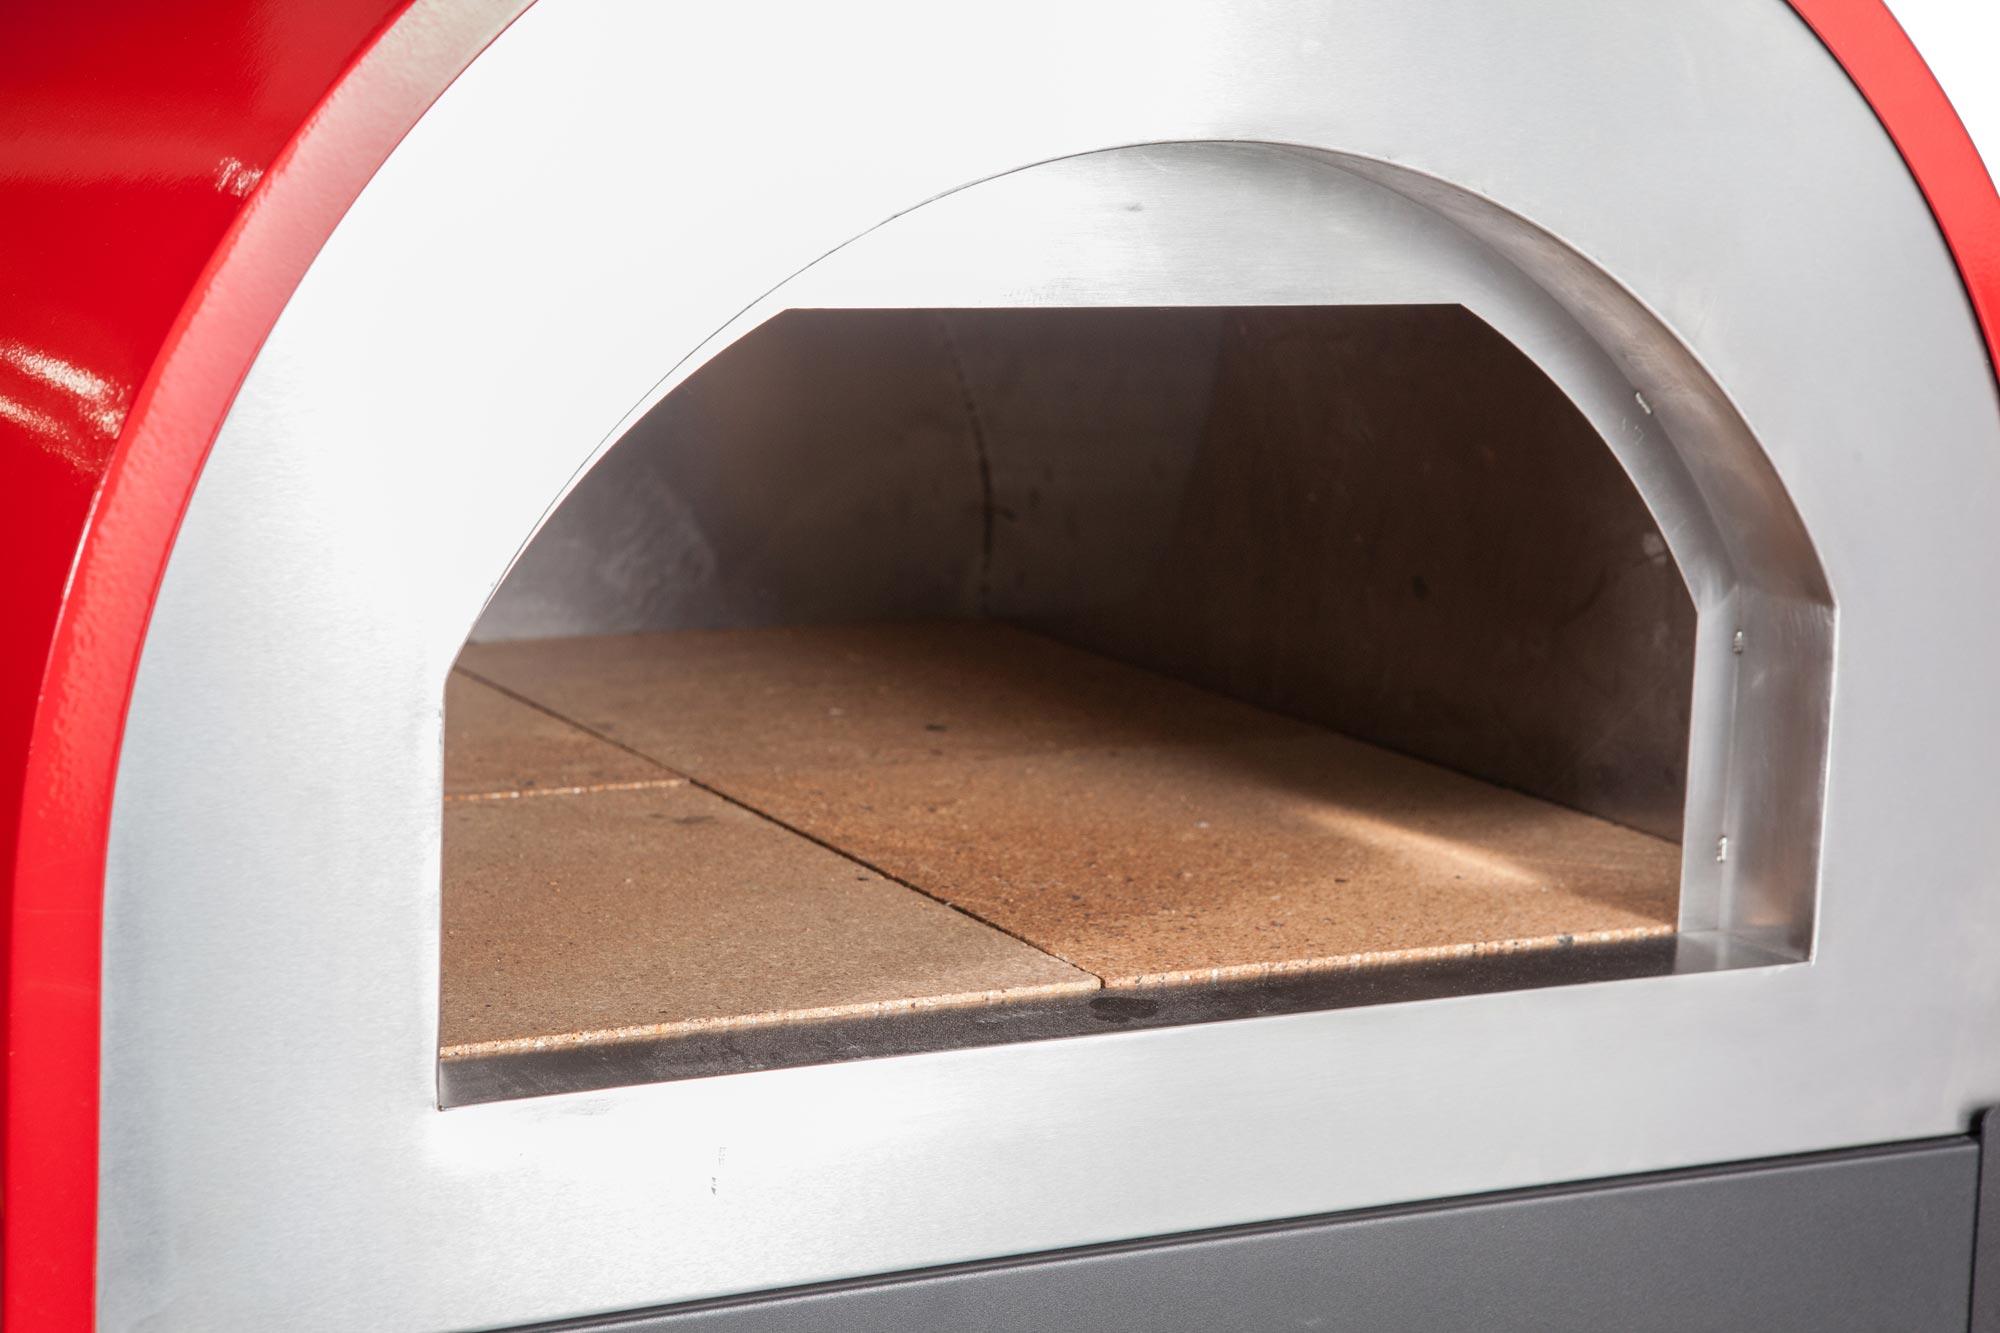 Pizzaofen / Brotbackofen / Flammkuchenofen D6055 Napoli mit Gestell Bild 4